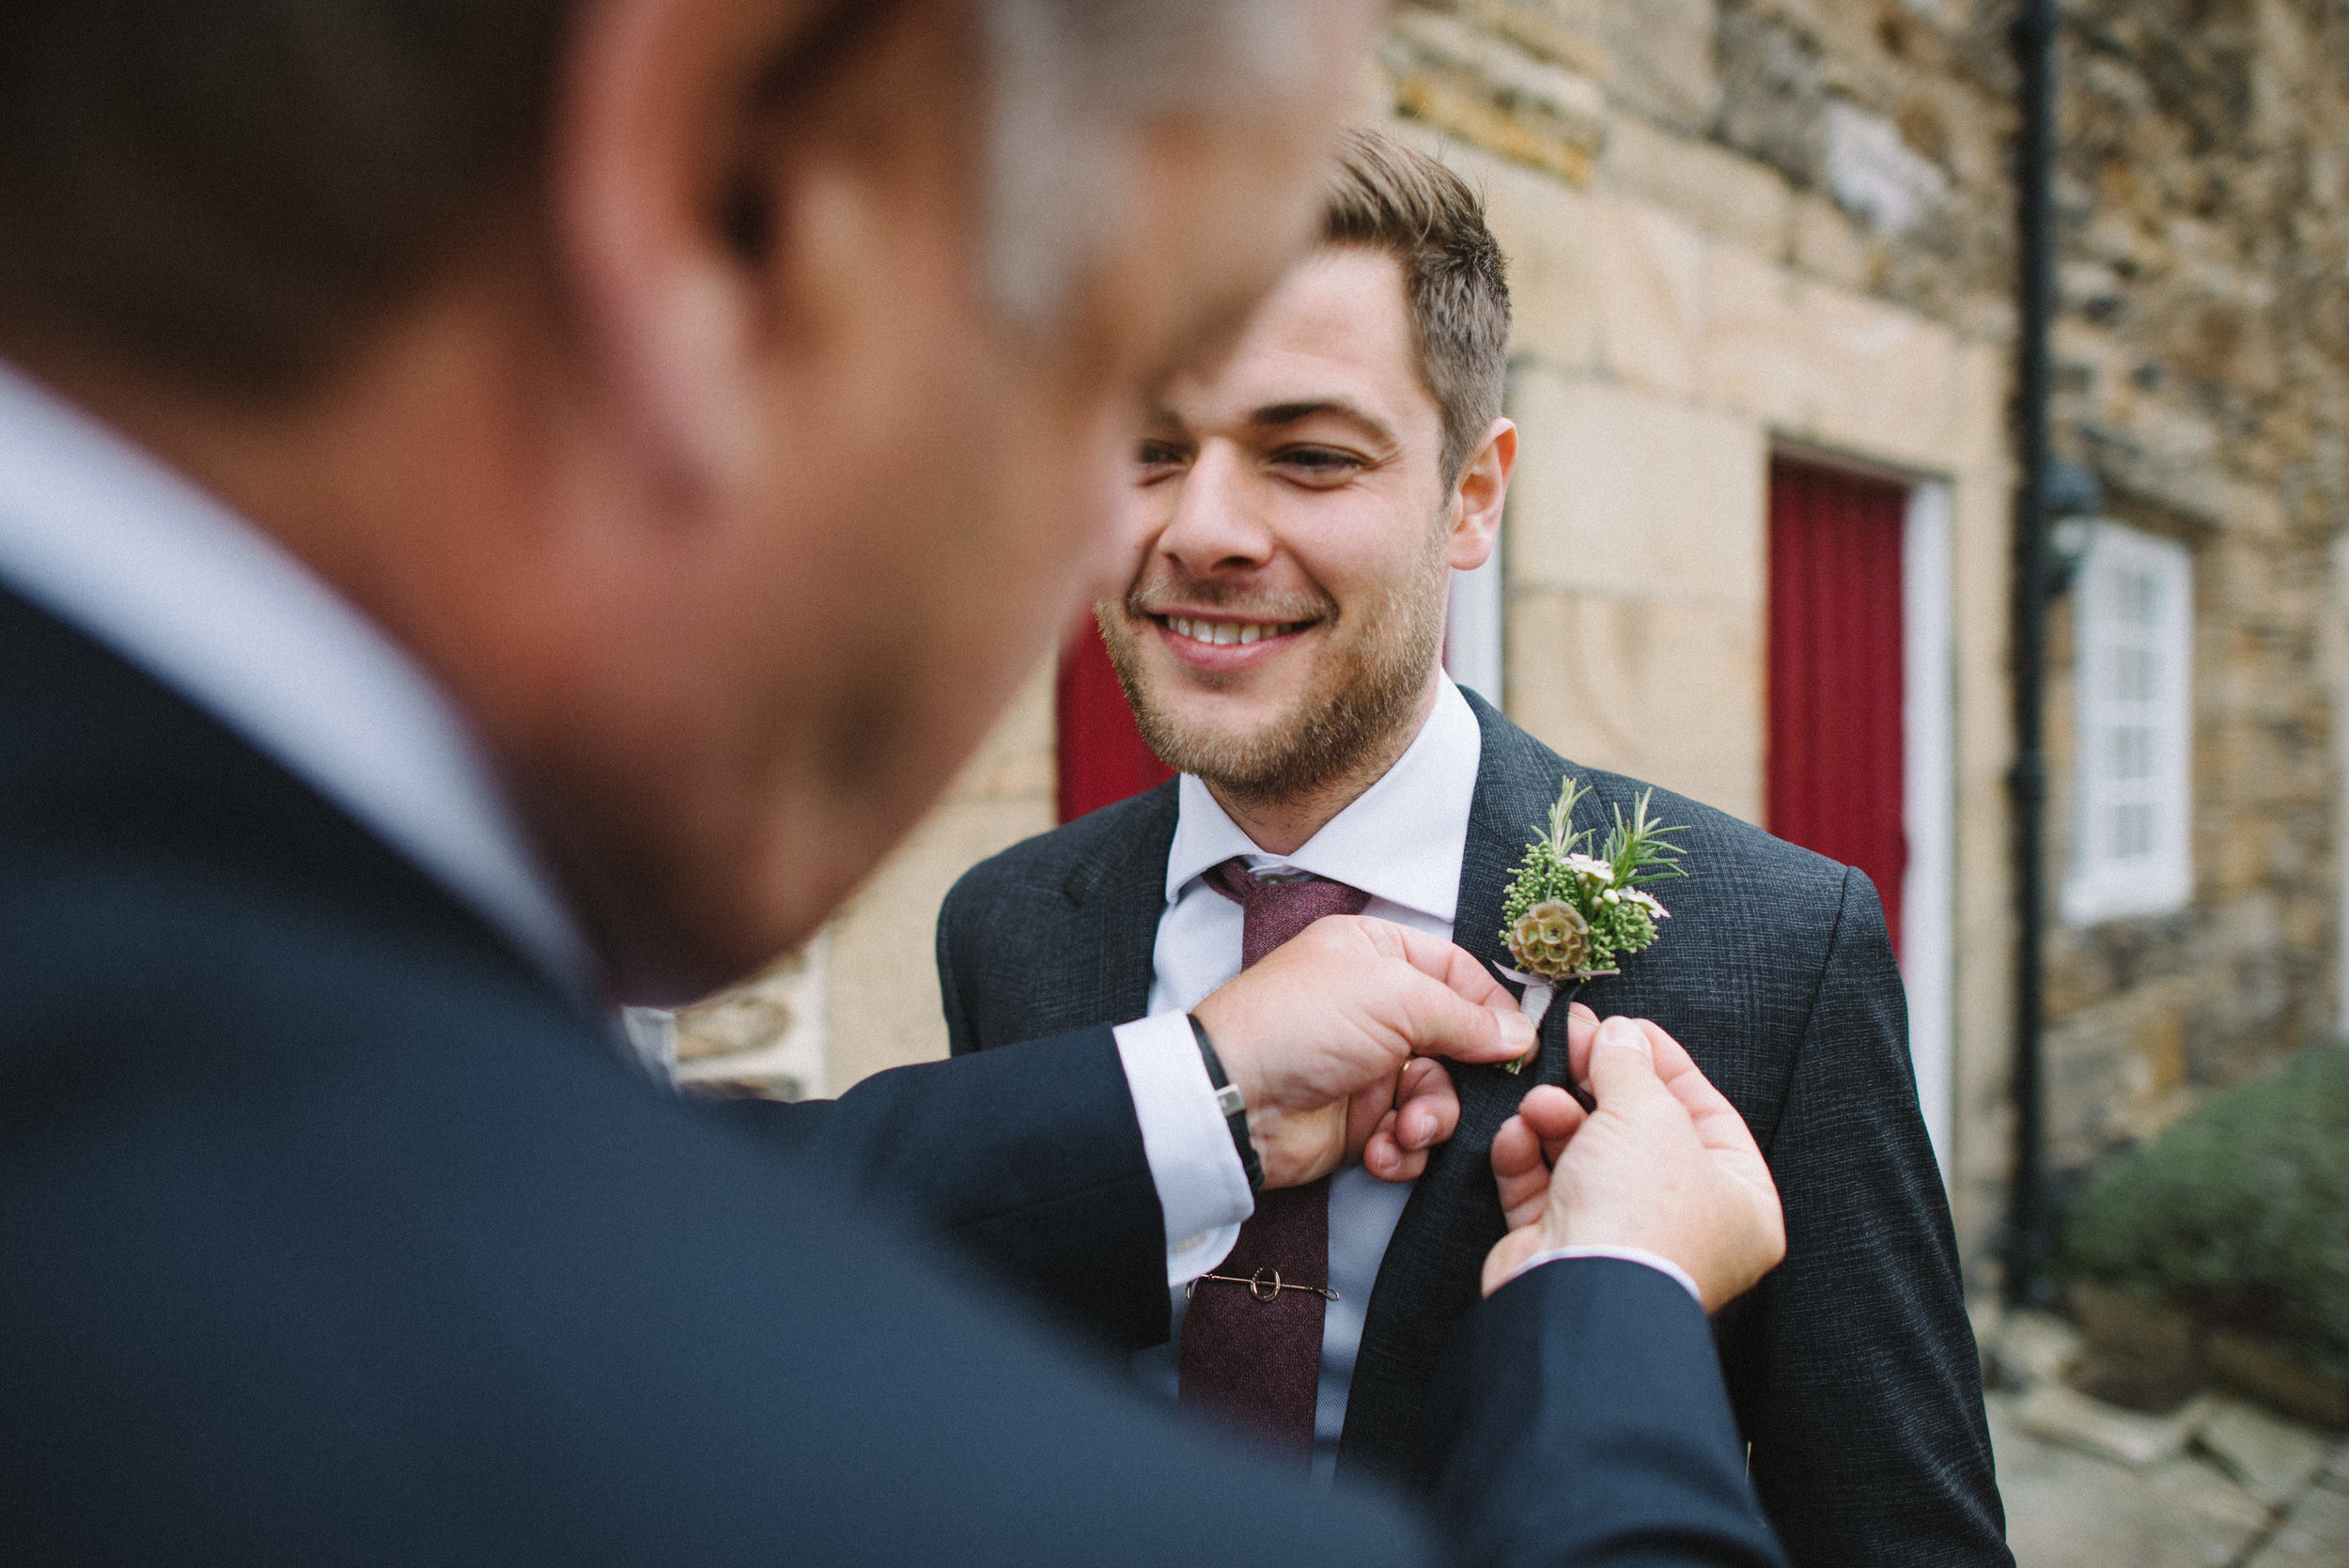 0070-LISA-DEVINE-PHOTOGRAPHY-ALTERNATIVE-WEDDING-PHOTOGRAPHY-SCOTLAND-DESTINATION-WEDDINGS-GLASGOW-WEDDINGS-COOL-WEDDINGS-STYLISH-WEDDINGS.JPG